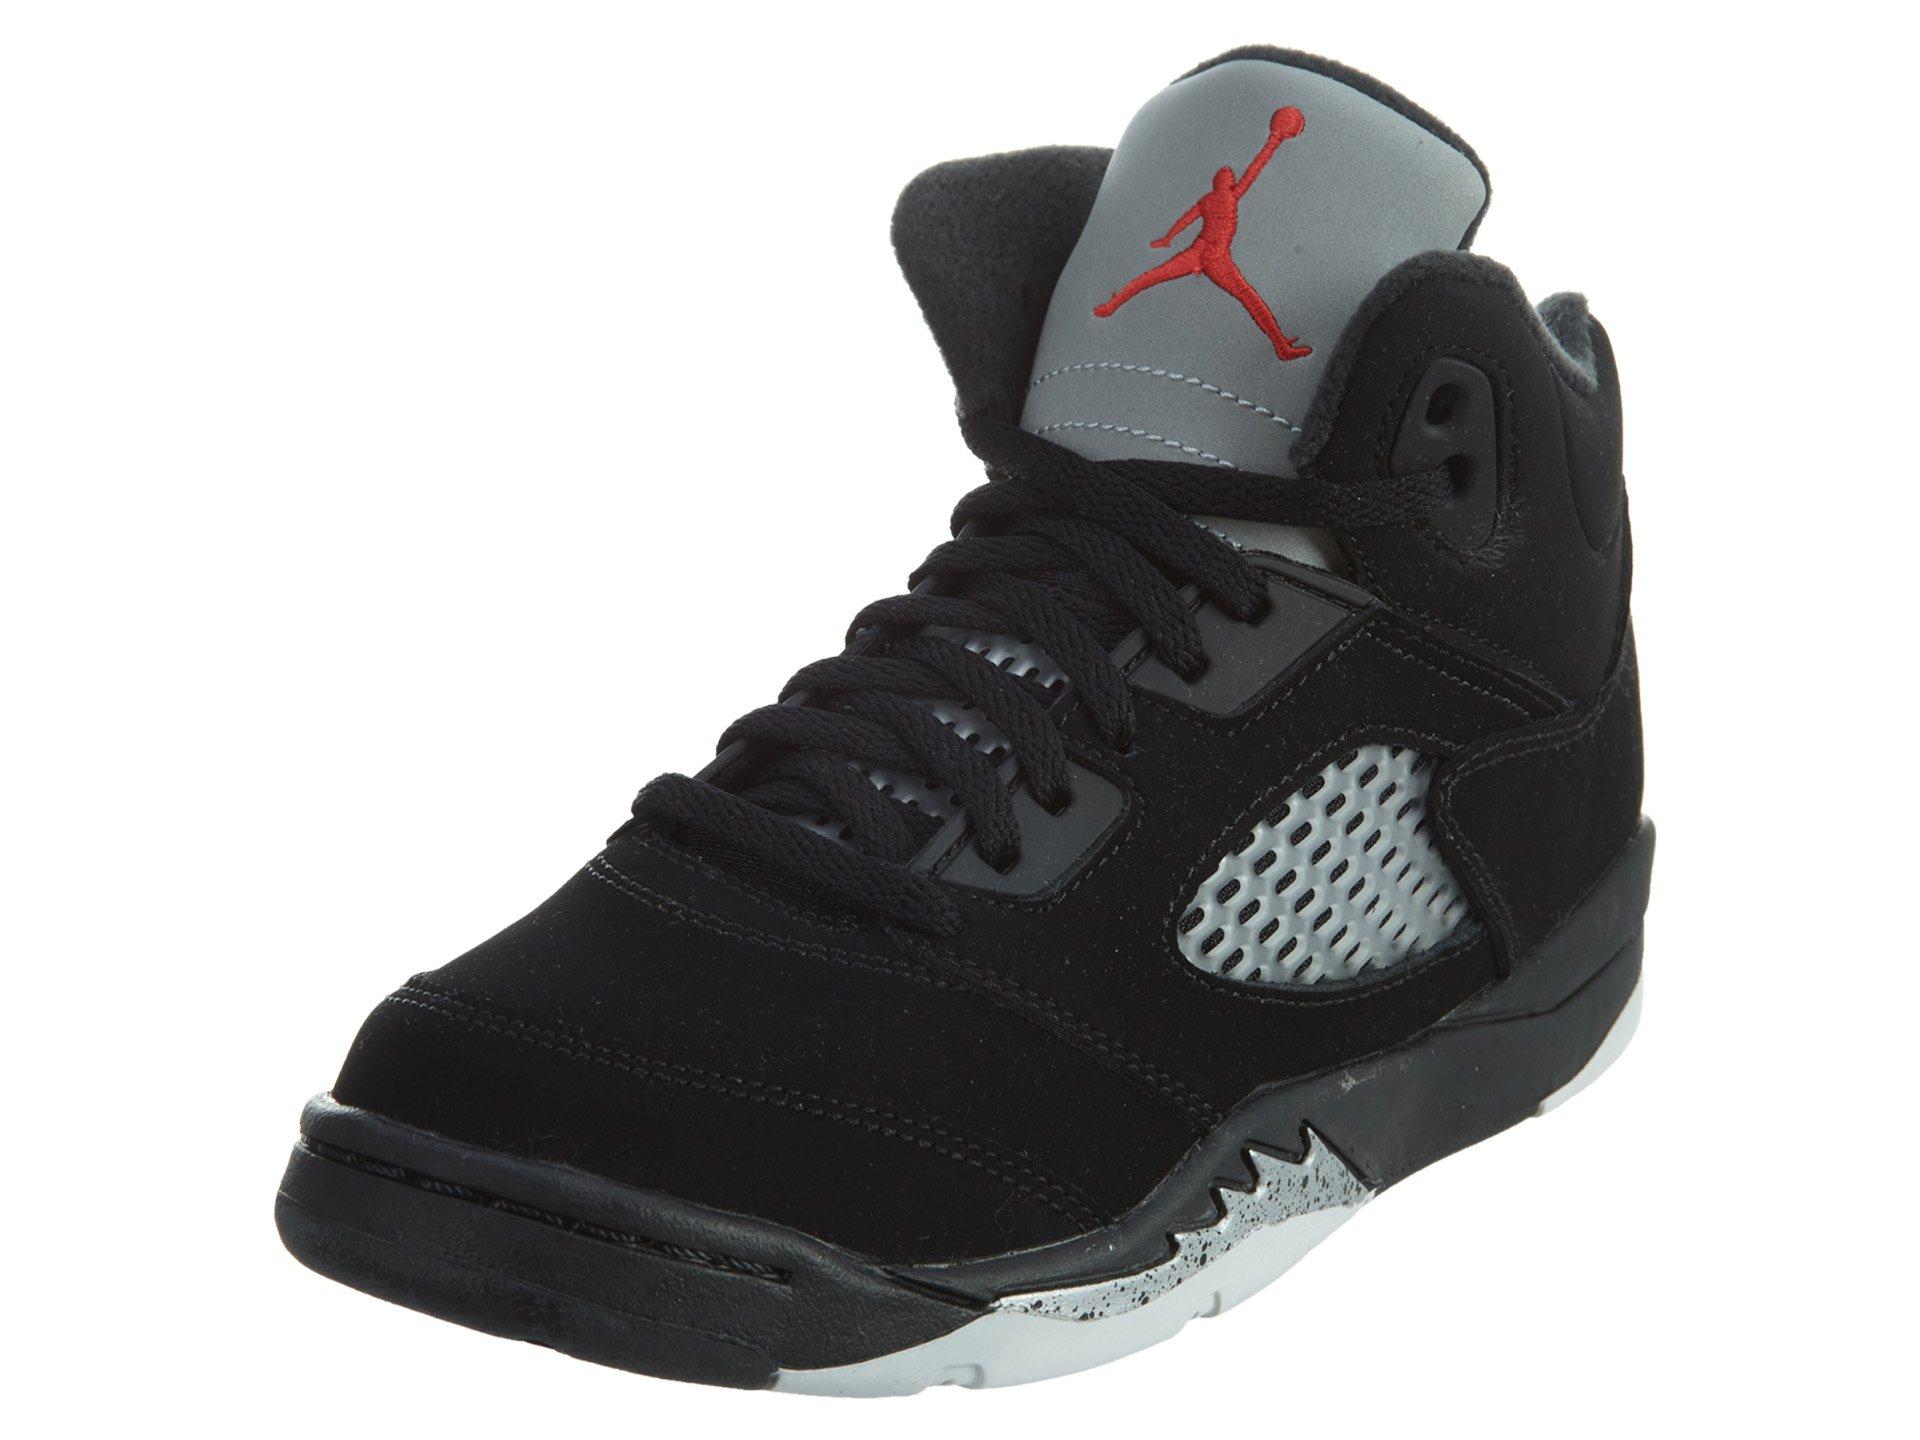 Nike Baby Boys Air Jordan 5 Retro BP OG Metallic Black/Fire Red-Mtllc Silver Suede Size 1Y